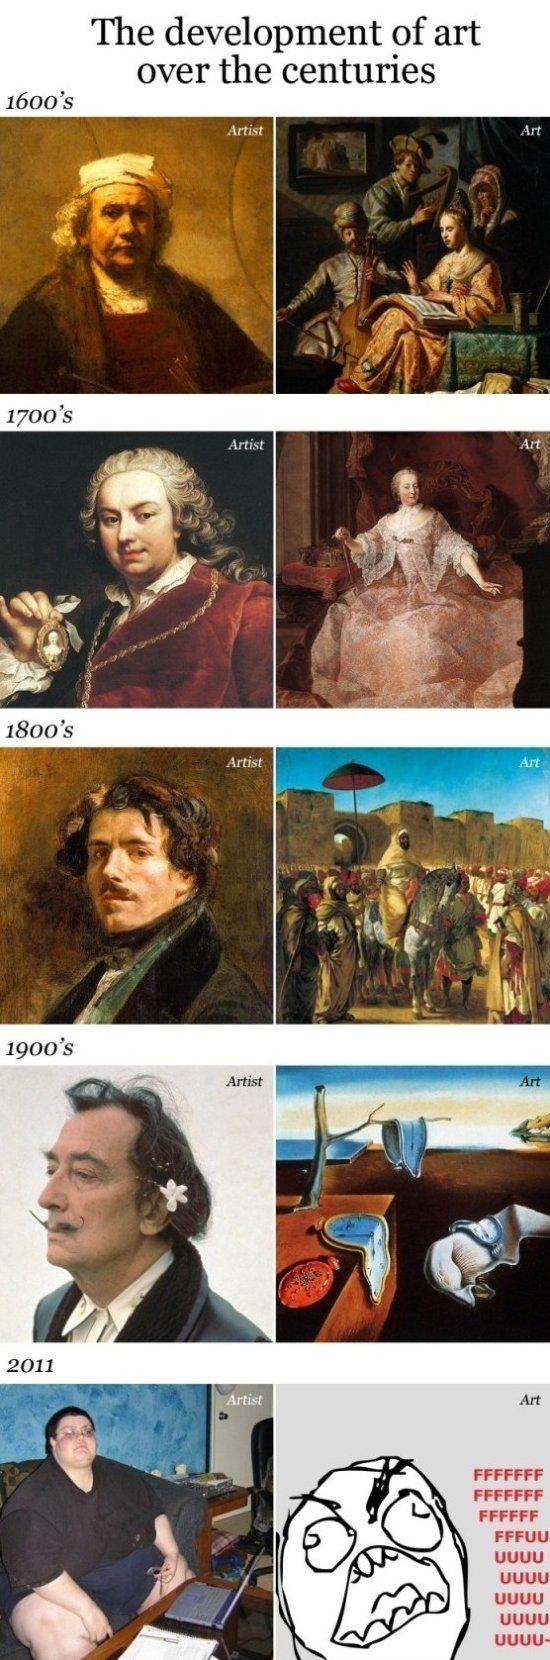 The Development of Art